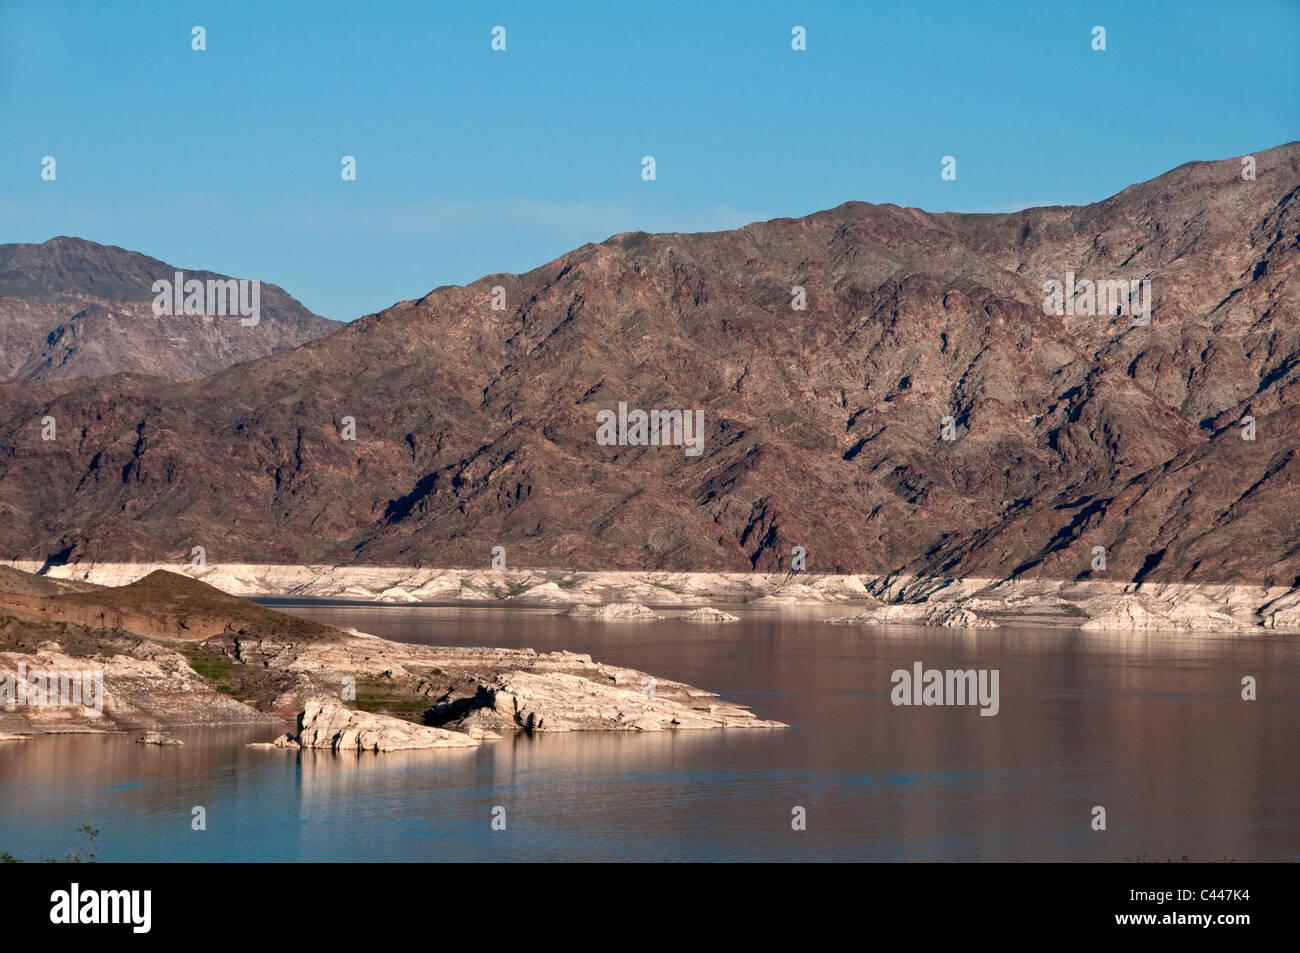 Badewanne ring, Lake Mead, See, Dürre, Nevada, März, Landschaft, USA, Nordamerika, Amerika Stockbild